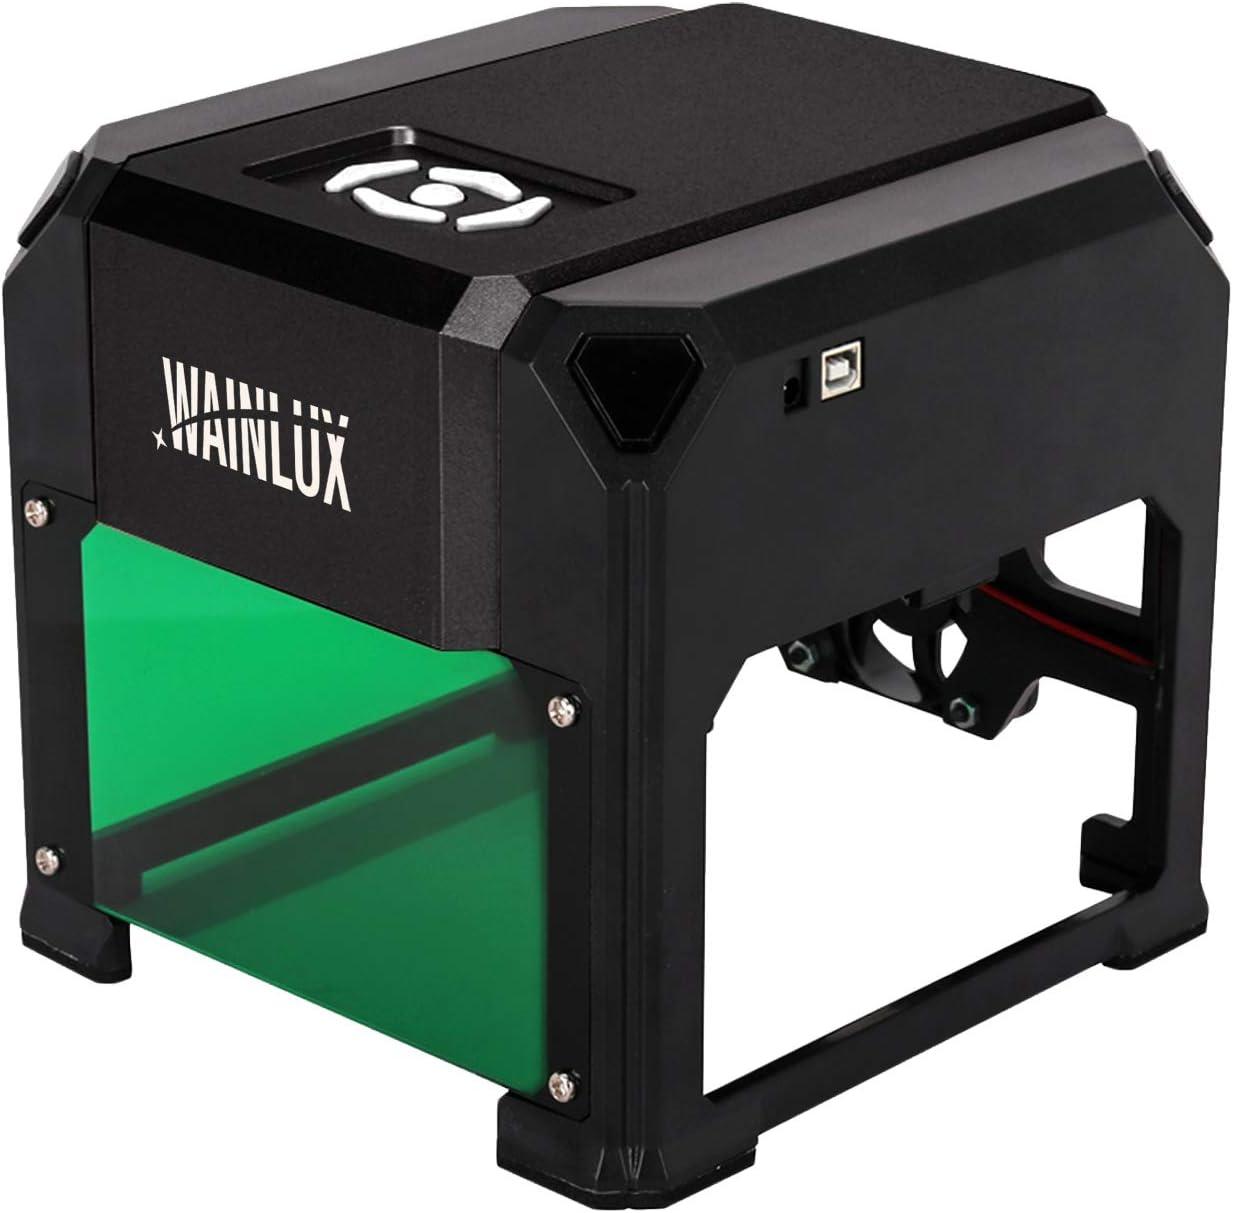 "WAINLUX K4 Laser Engraving Machine, Mini Laser Engraver Support Win, MAC Connection, 3000mW Small Desktop Laser Marking Machine, Laser Etching Range 3.14""×3.14'', DIY Logo Dsign (Black)"